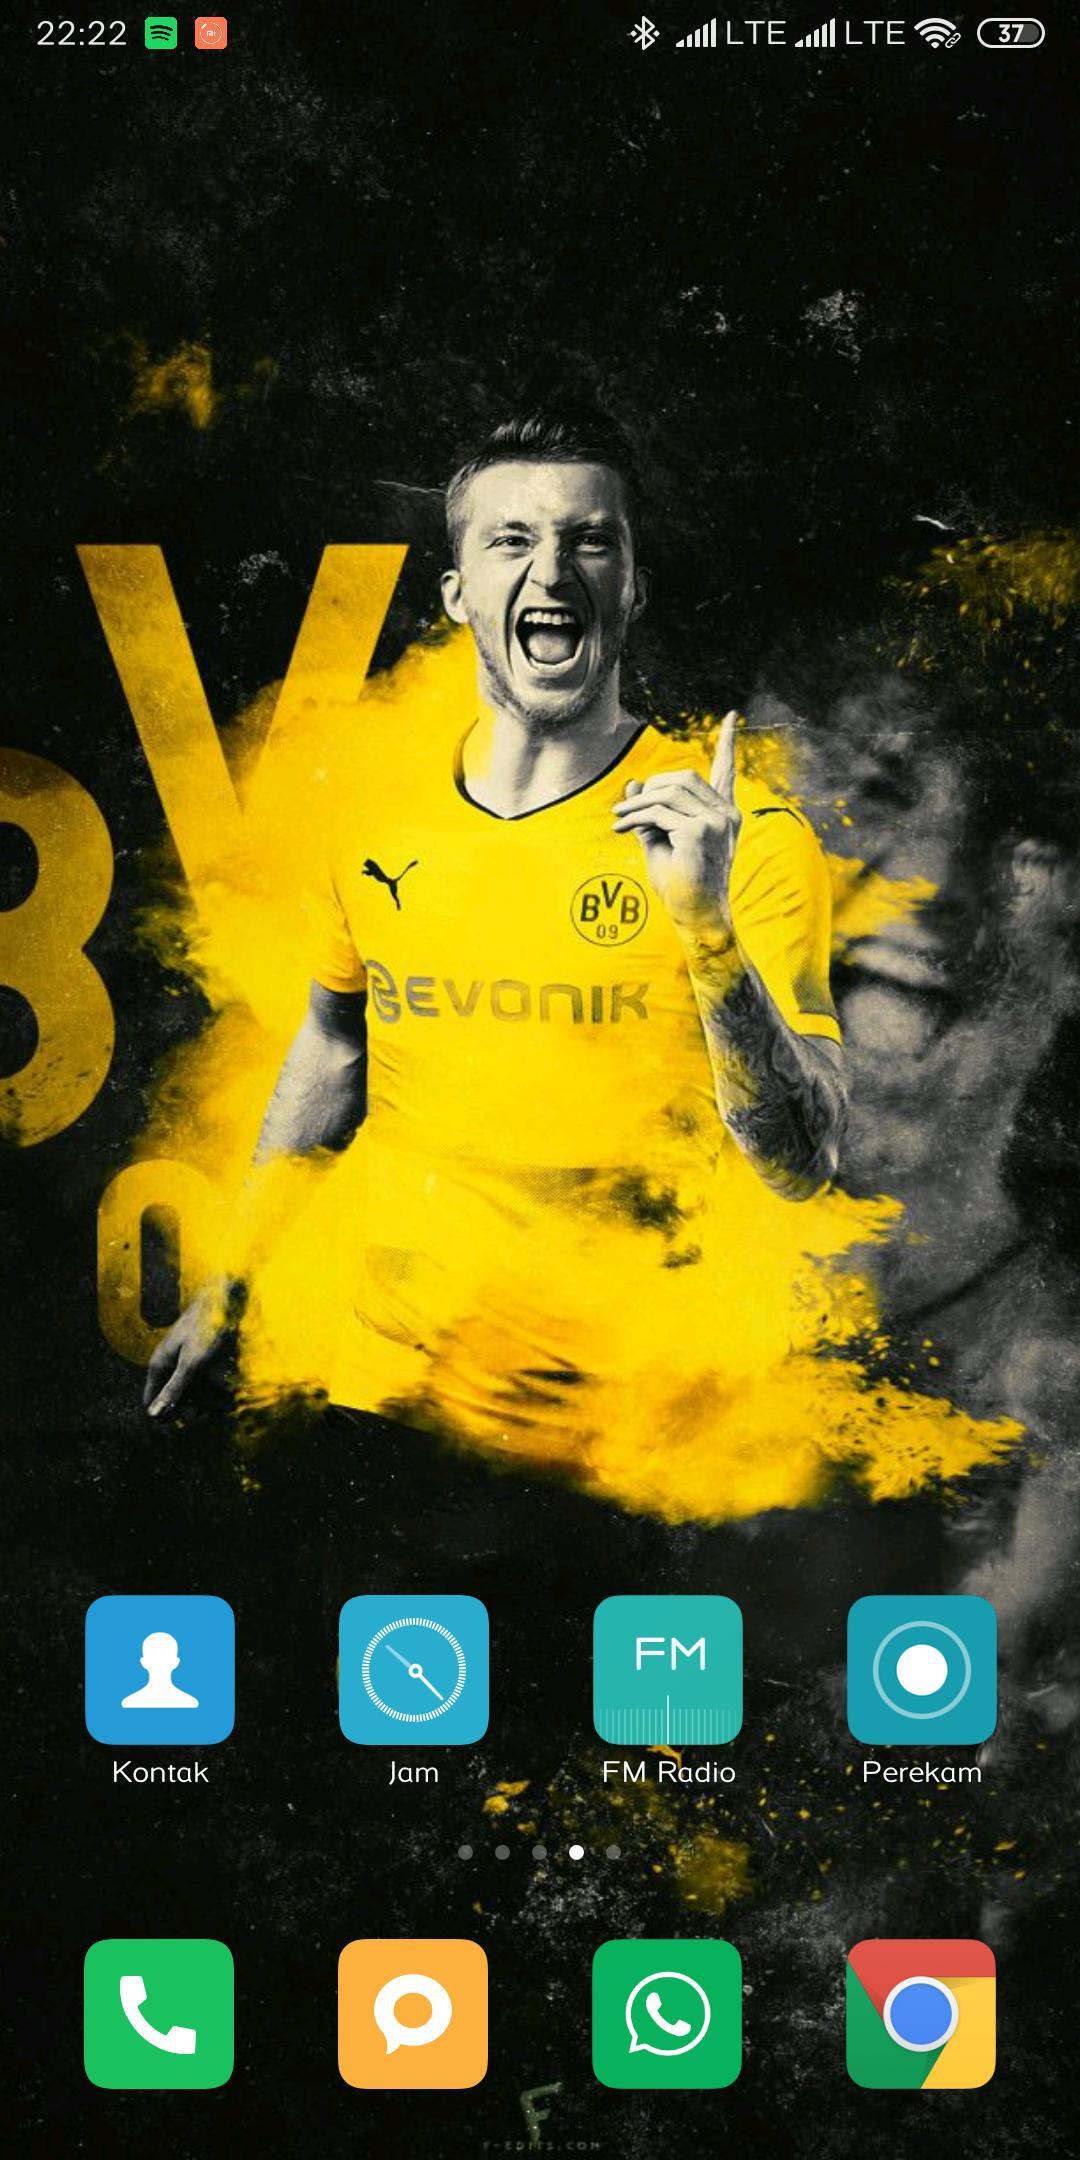 Hd Borussia Dortmund Wallpaper For Android Apk Download